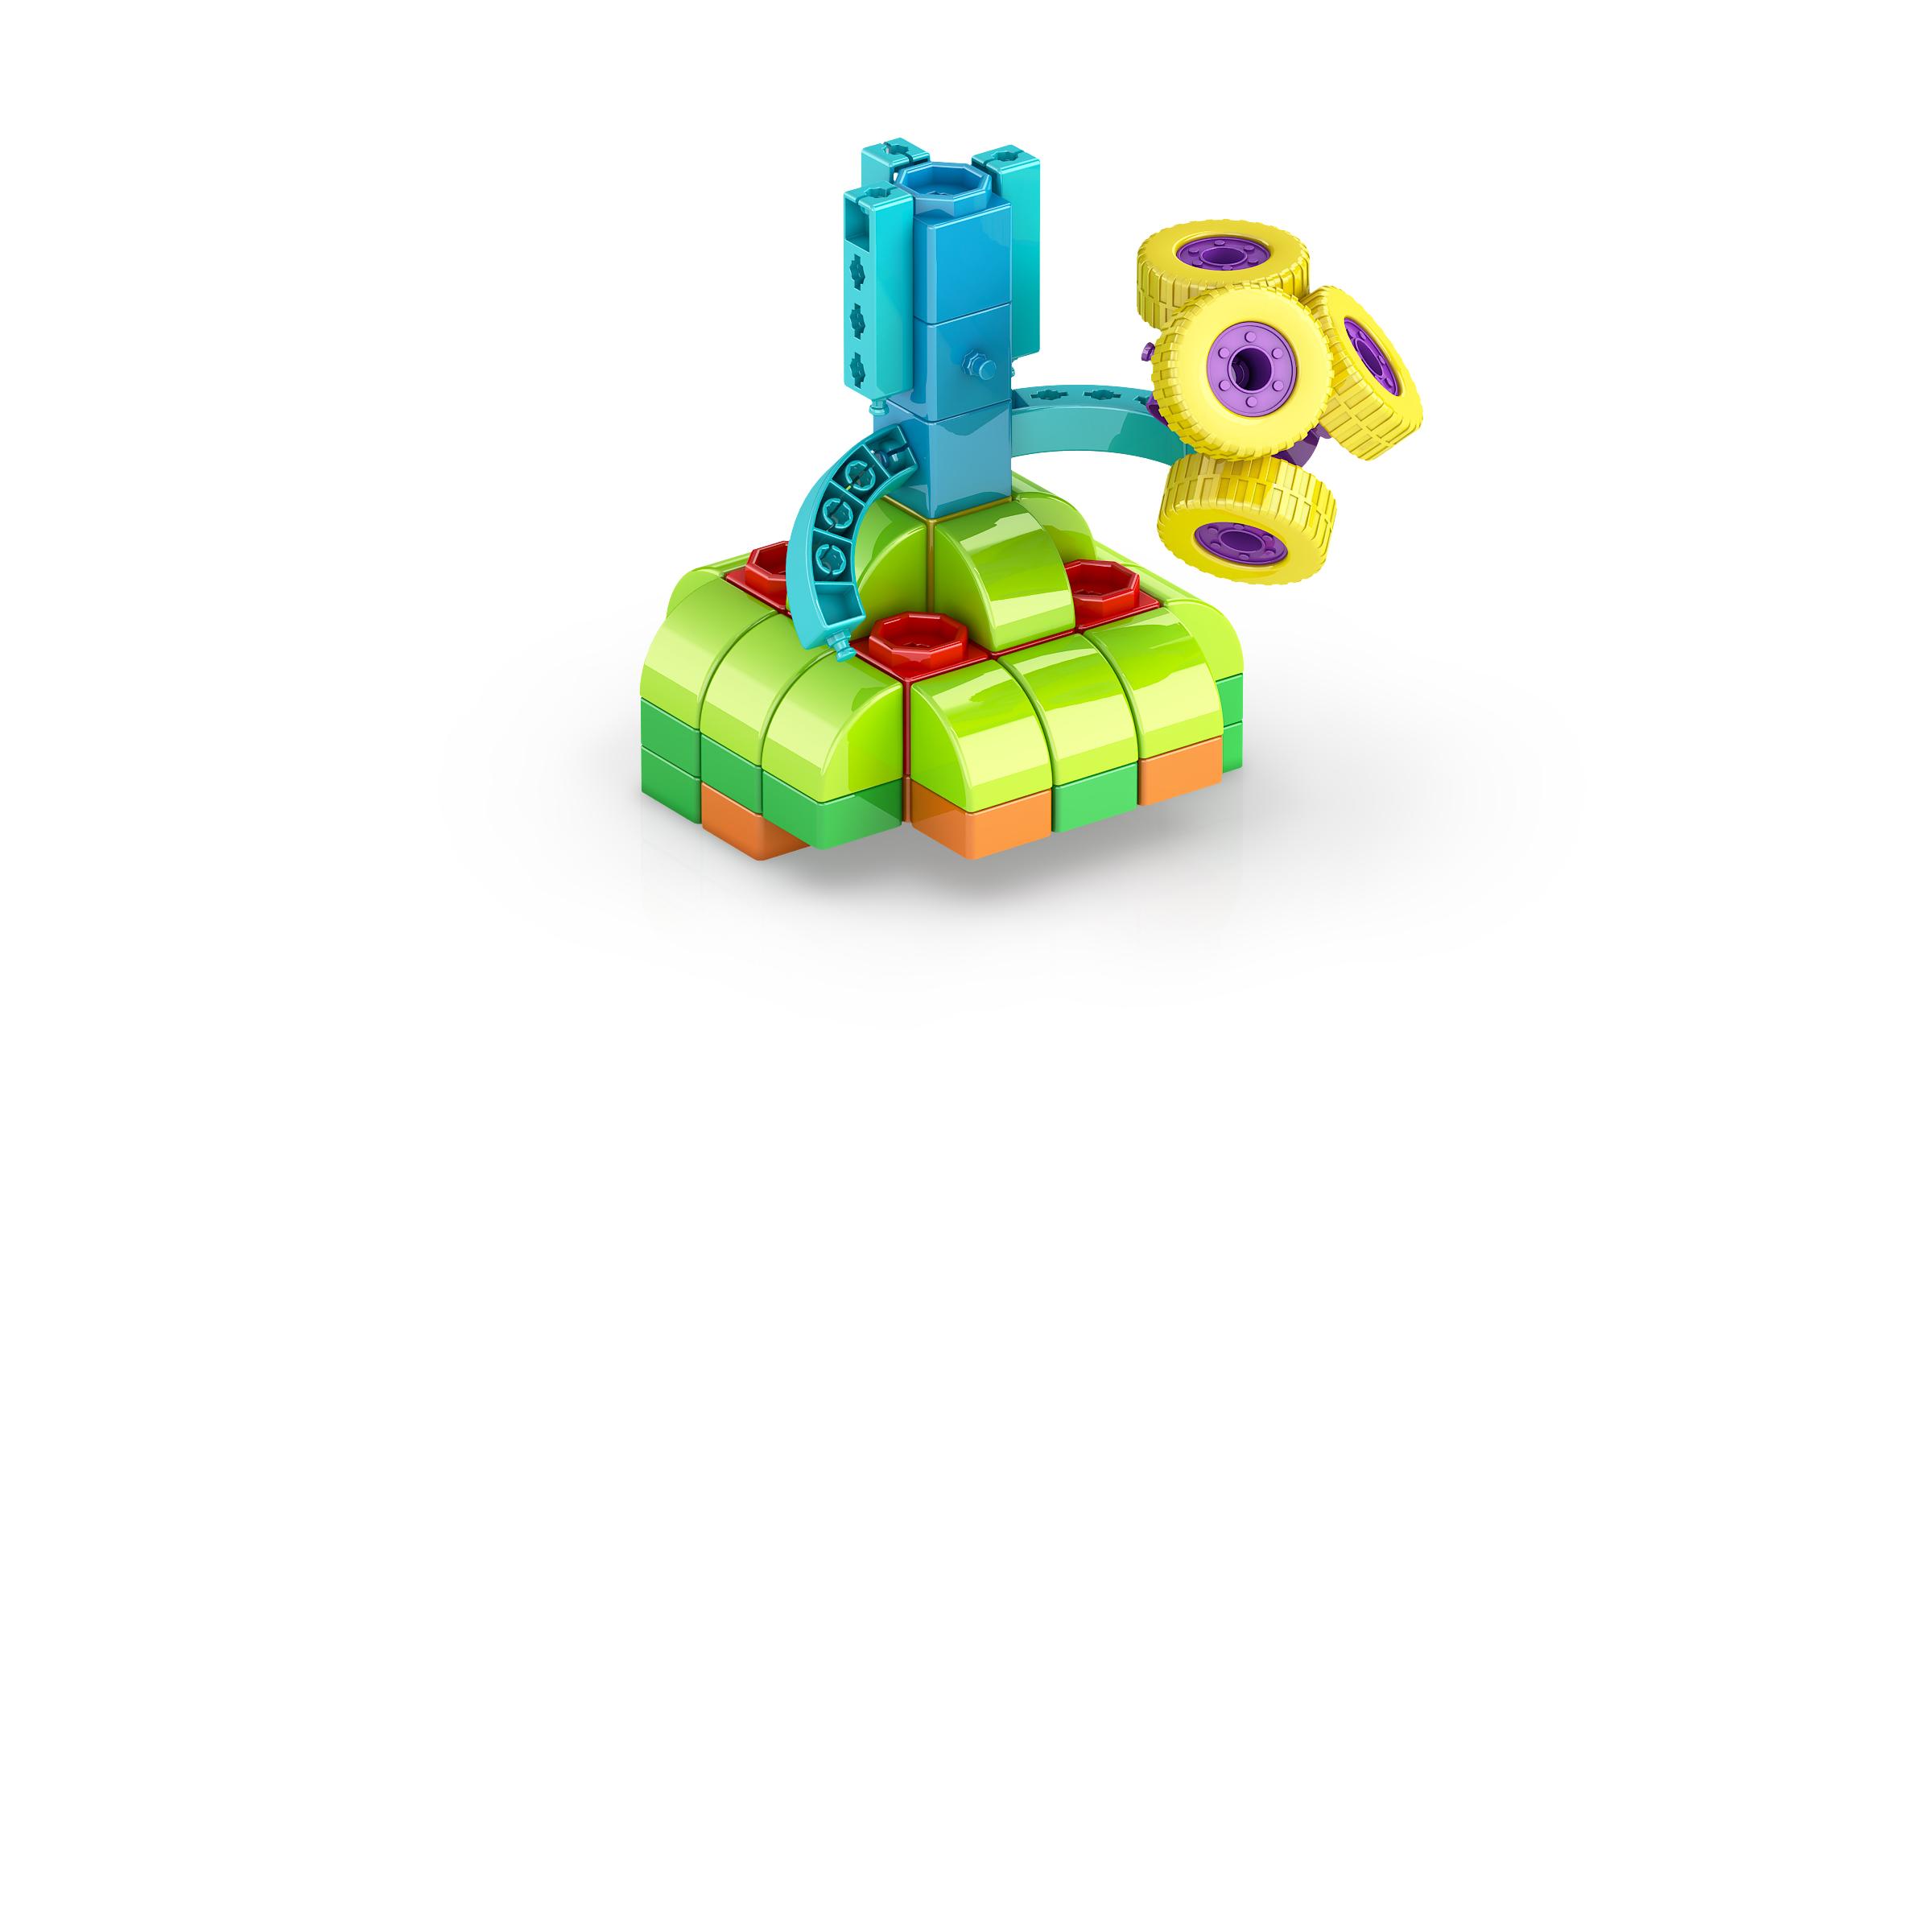 , Princess 1, משחקי חשיבה לילדים engino, משחקים לגיל הרך playgro, משחק הרכבות אנג'ינו, משחקי רכבות